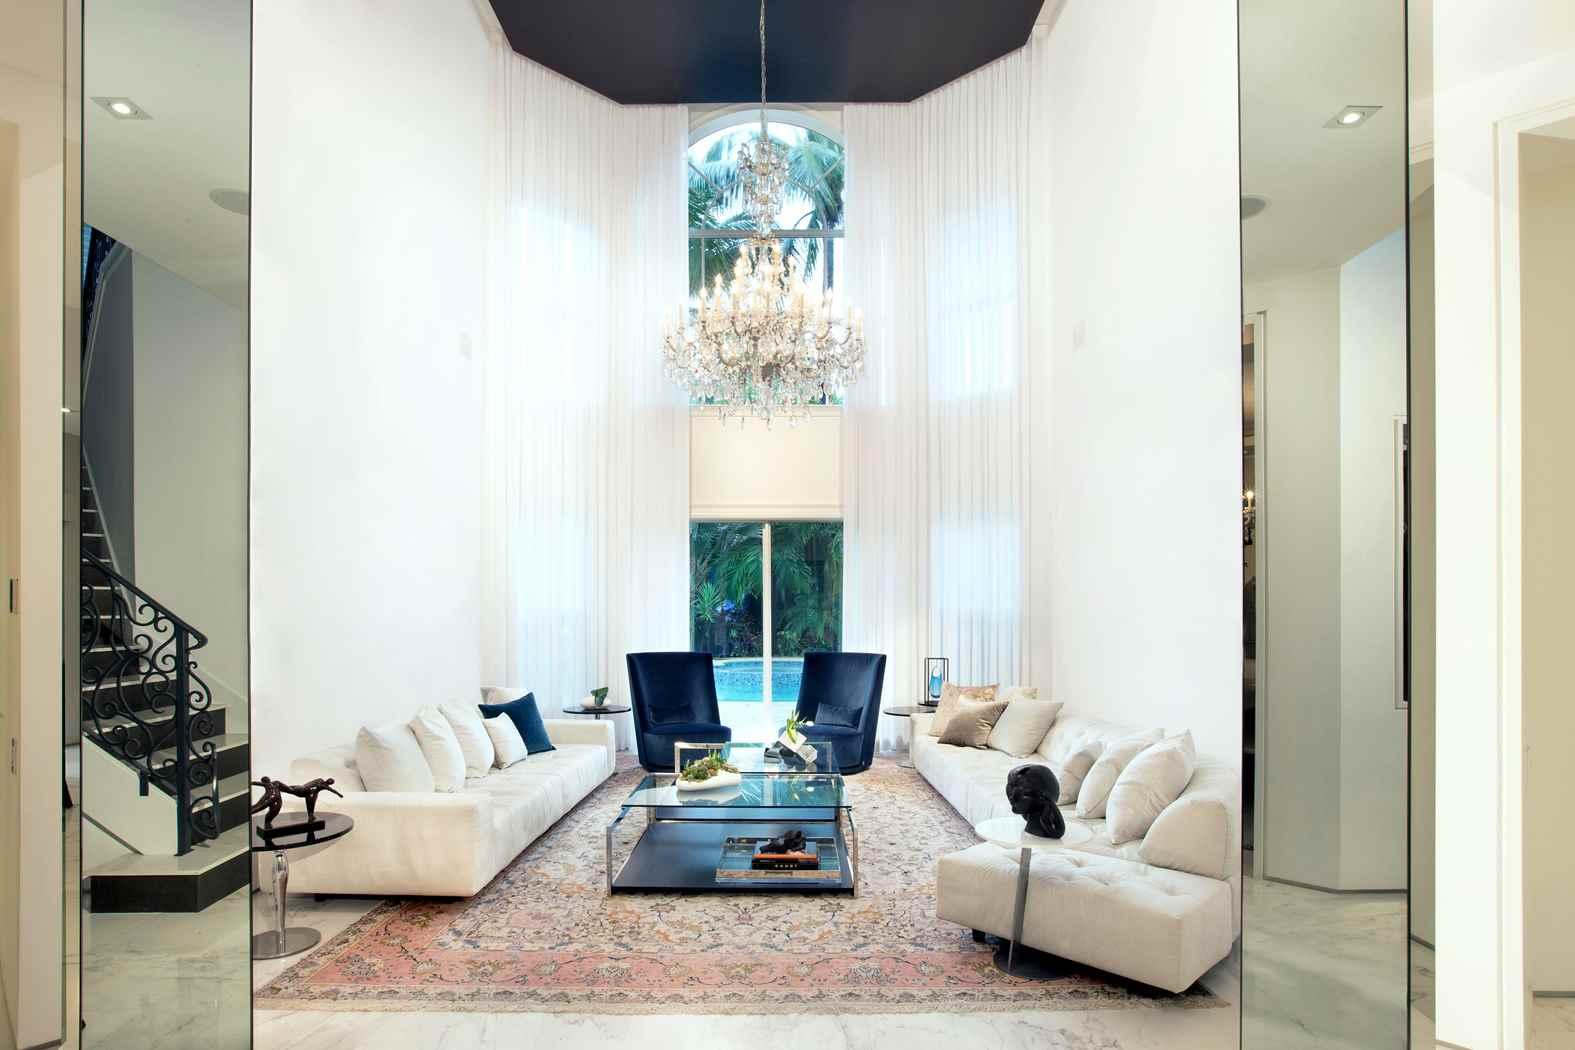 Miami Transitional Gem - Residential Interior Design From DKOR Interiors